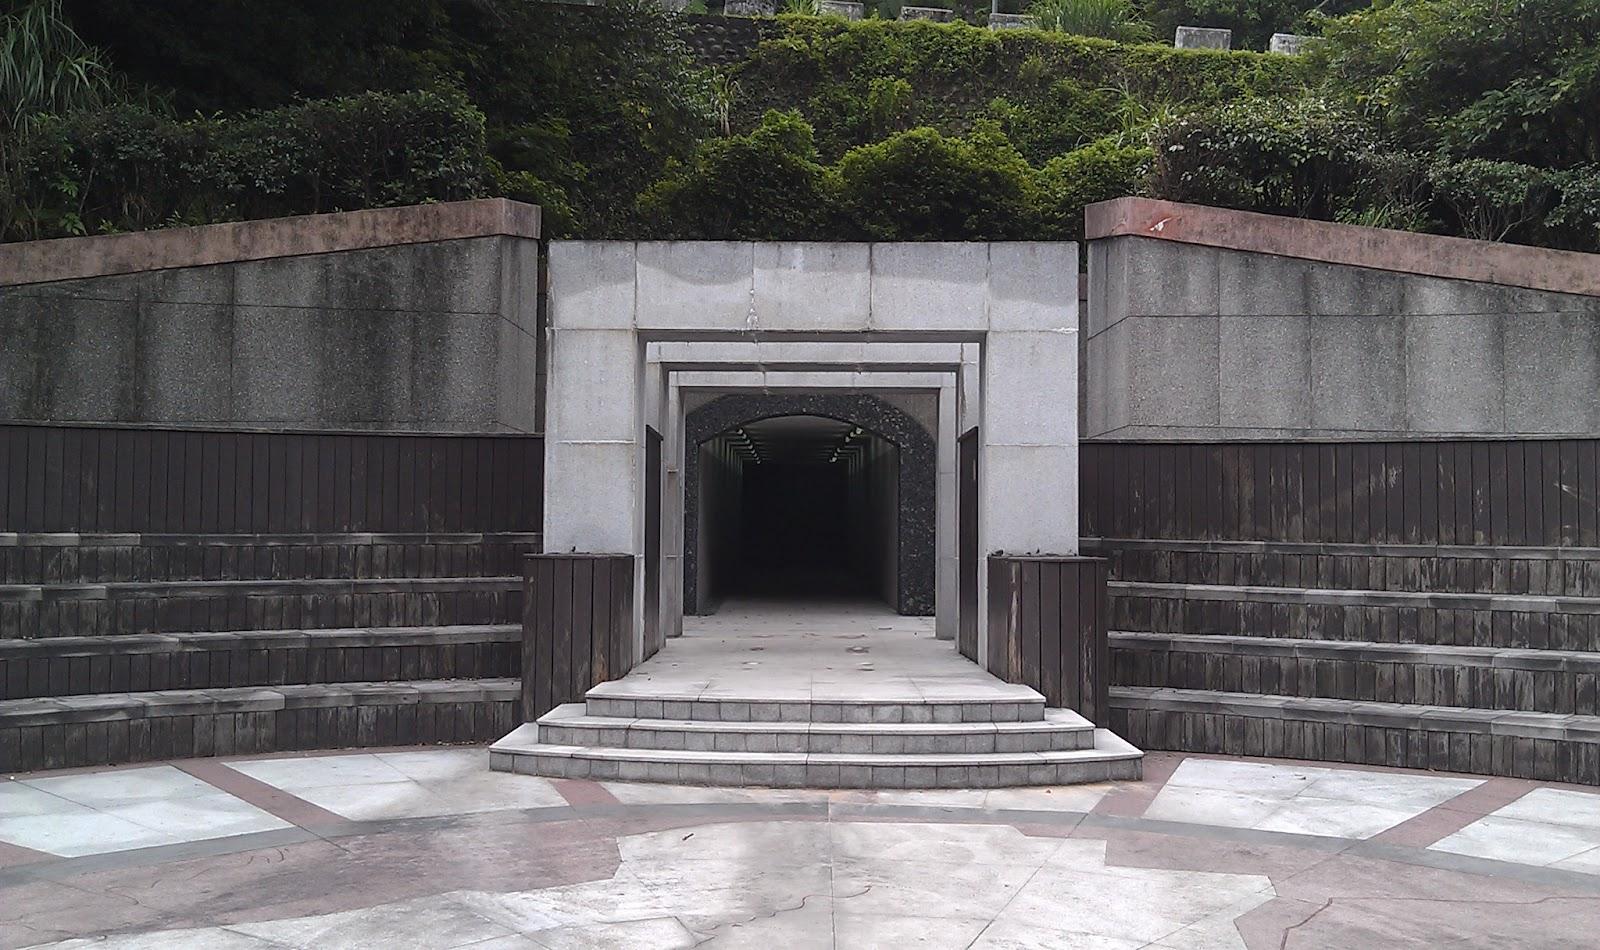 Praise The Formosan Sun Pricks Parks And Panting